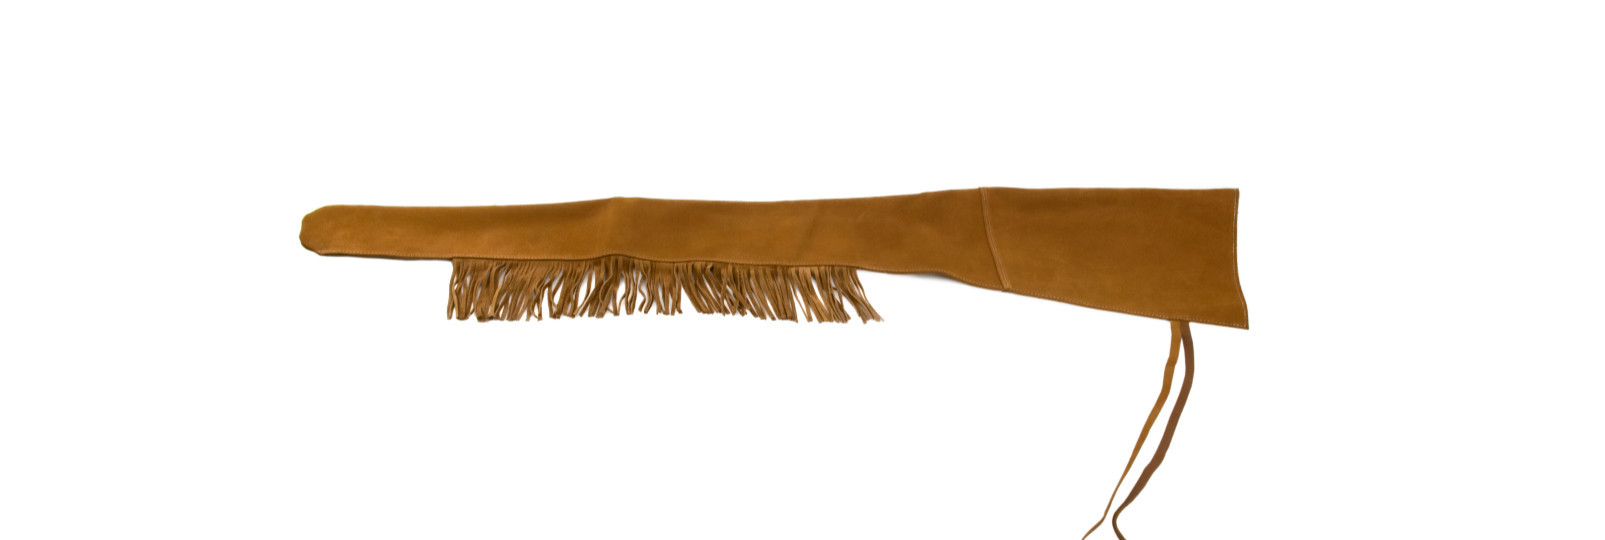 Extralong leather gun sleeve